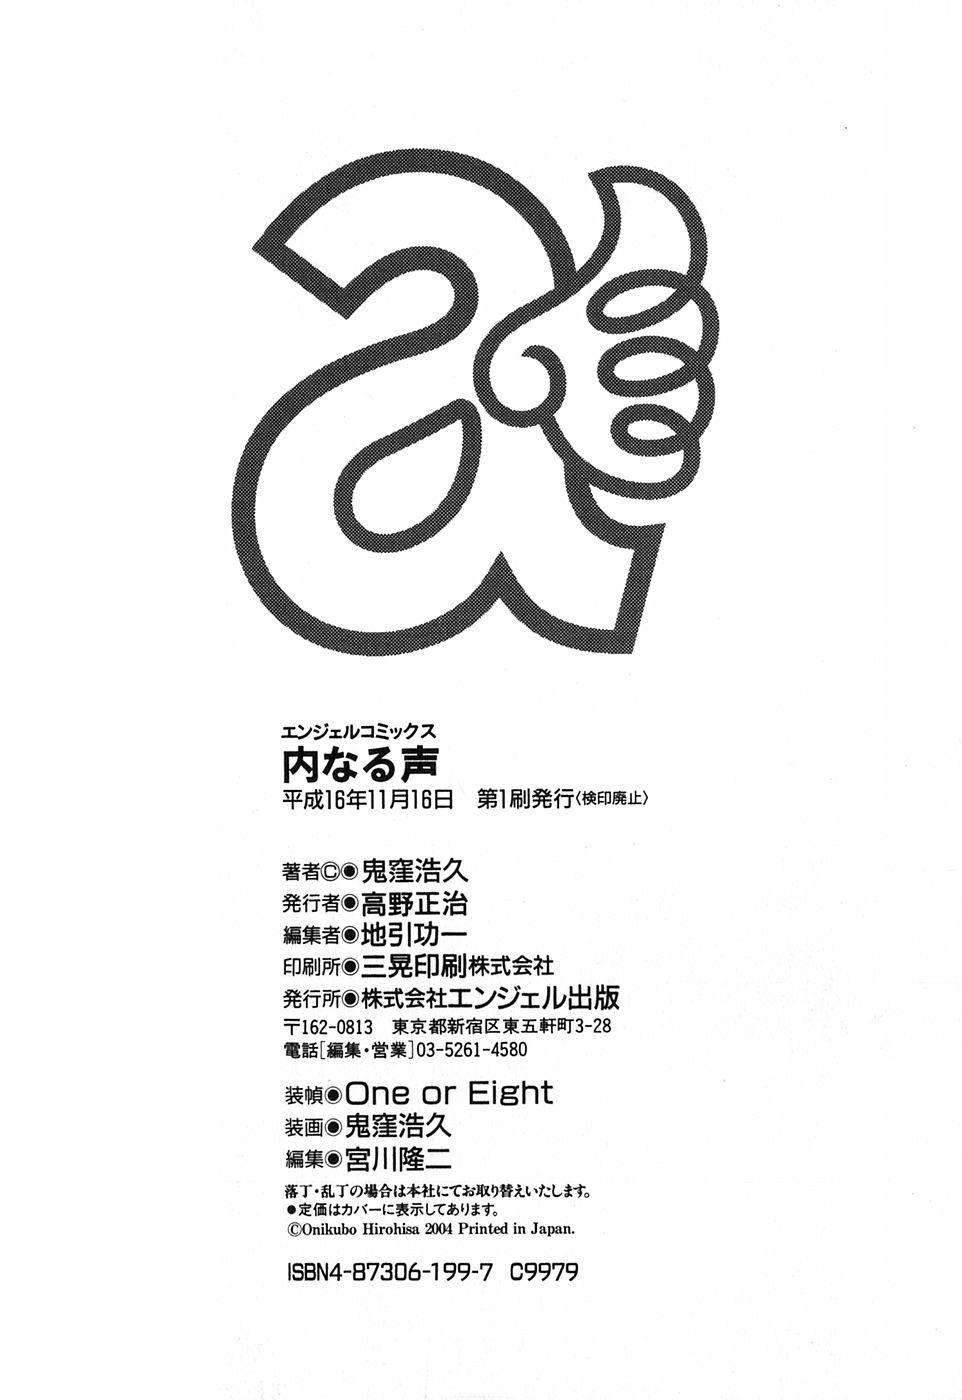 Uchi Naru Koe - Voice which becomes inside 193